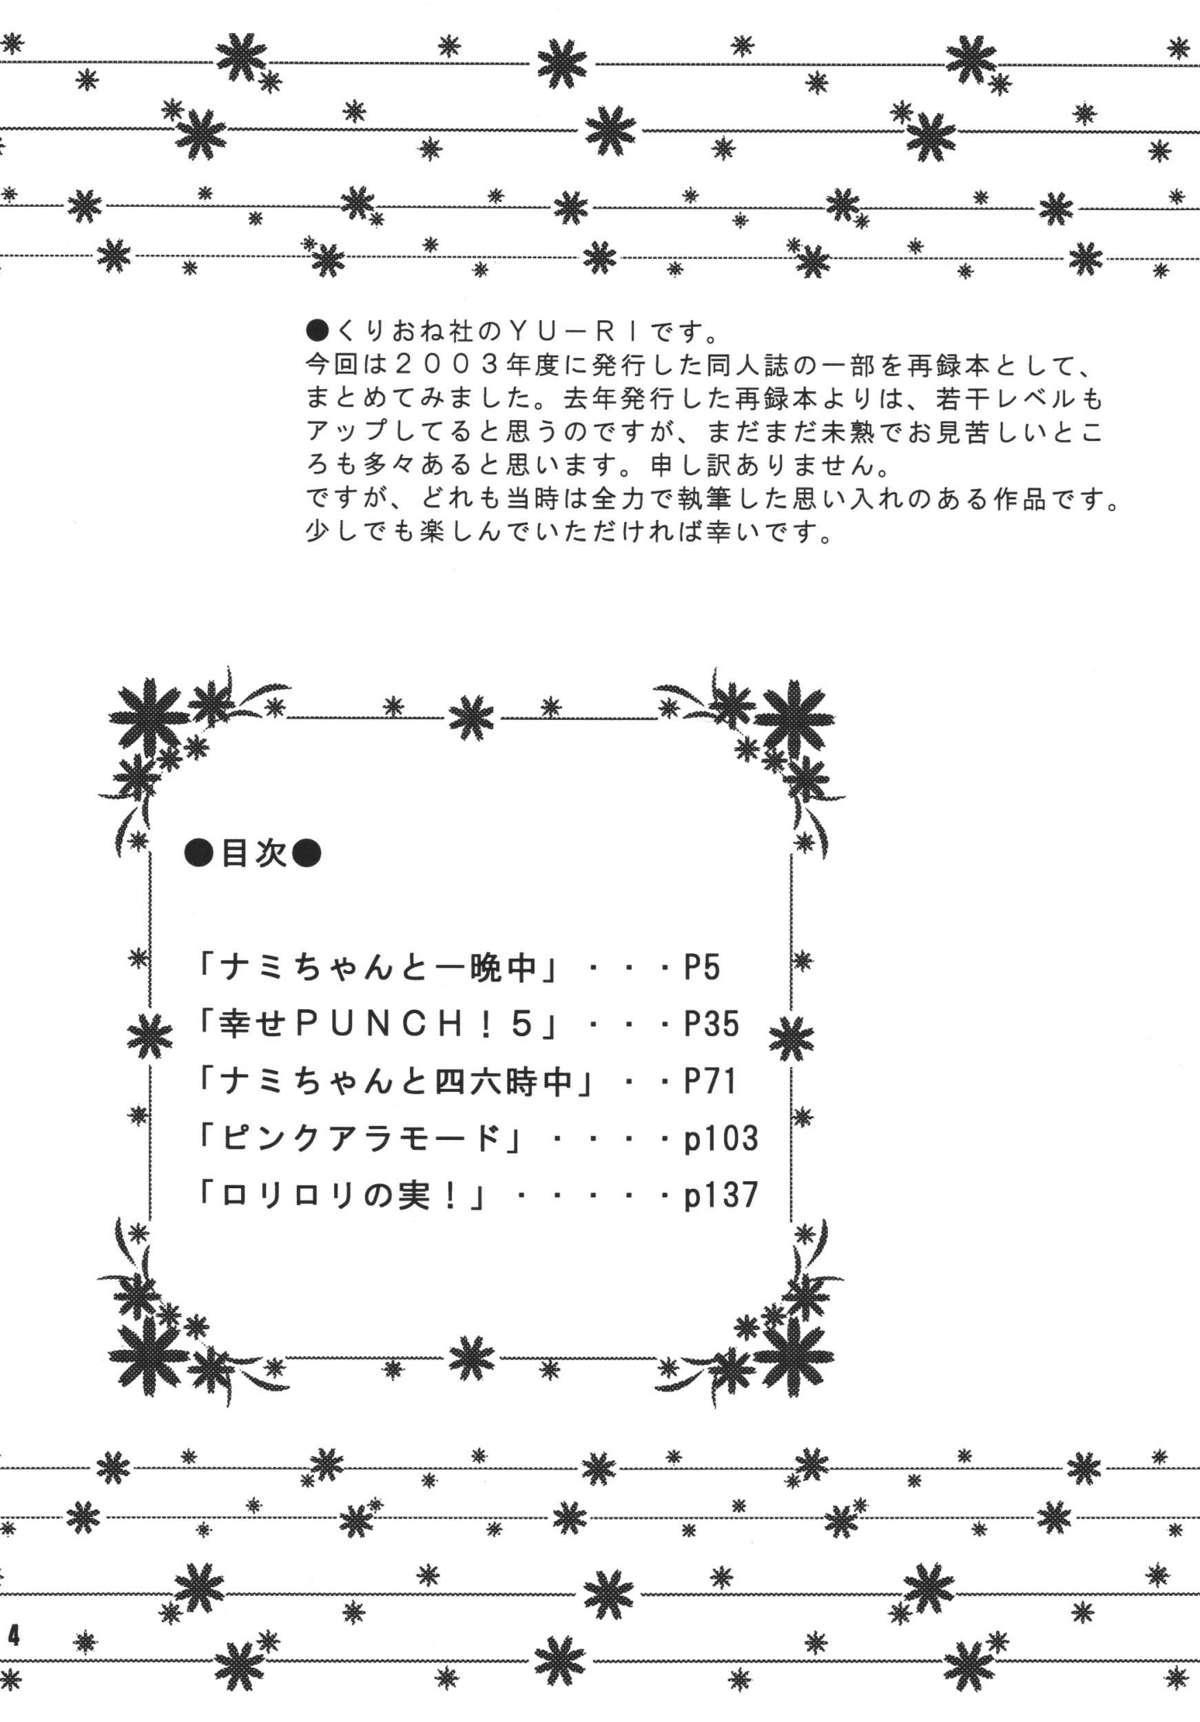 Kaizoku Musume. DX 2